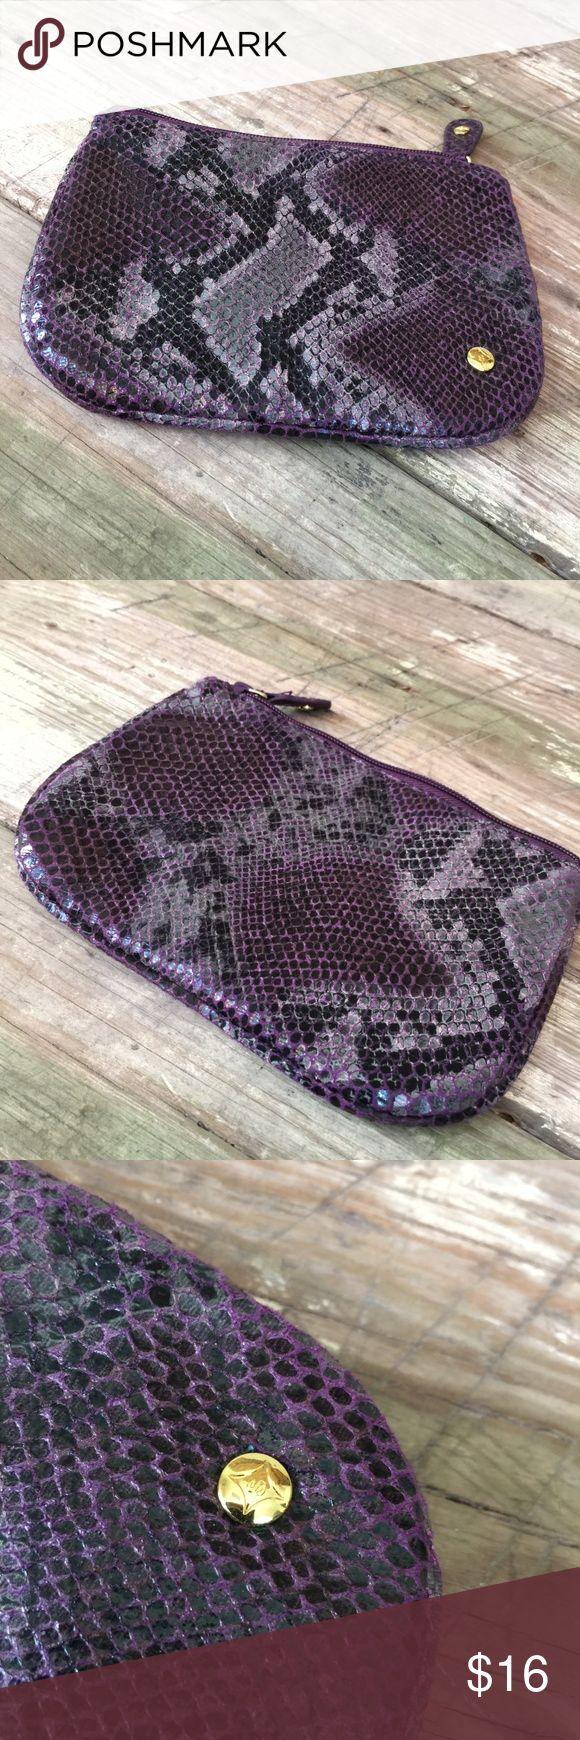 Stephanie Johnson snake print cosmetic bag pouch